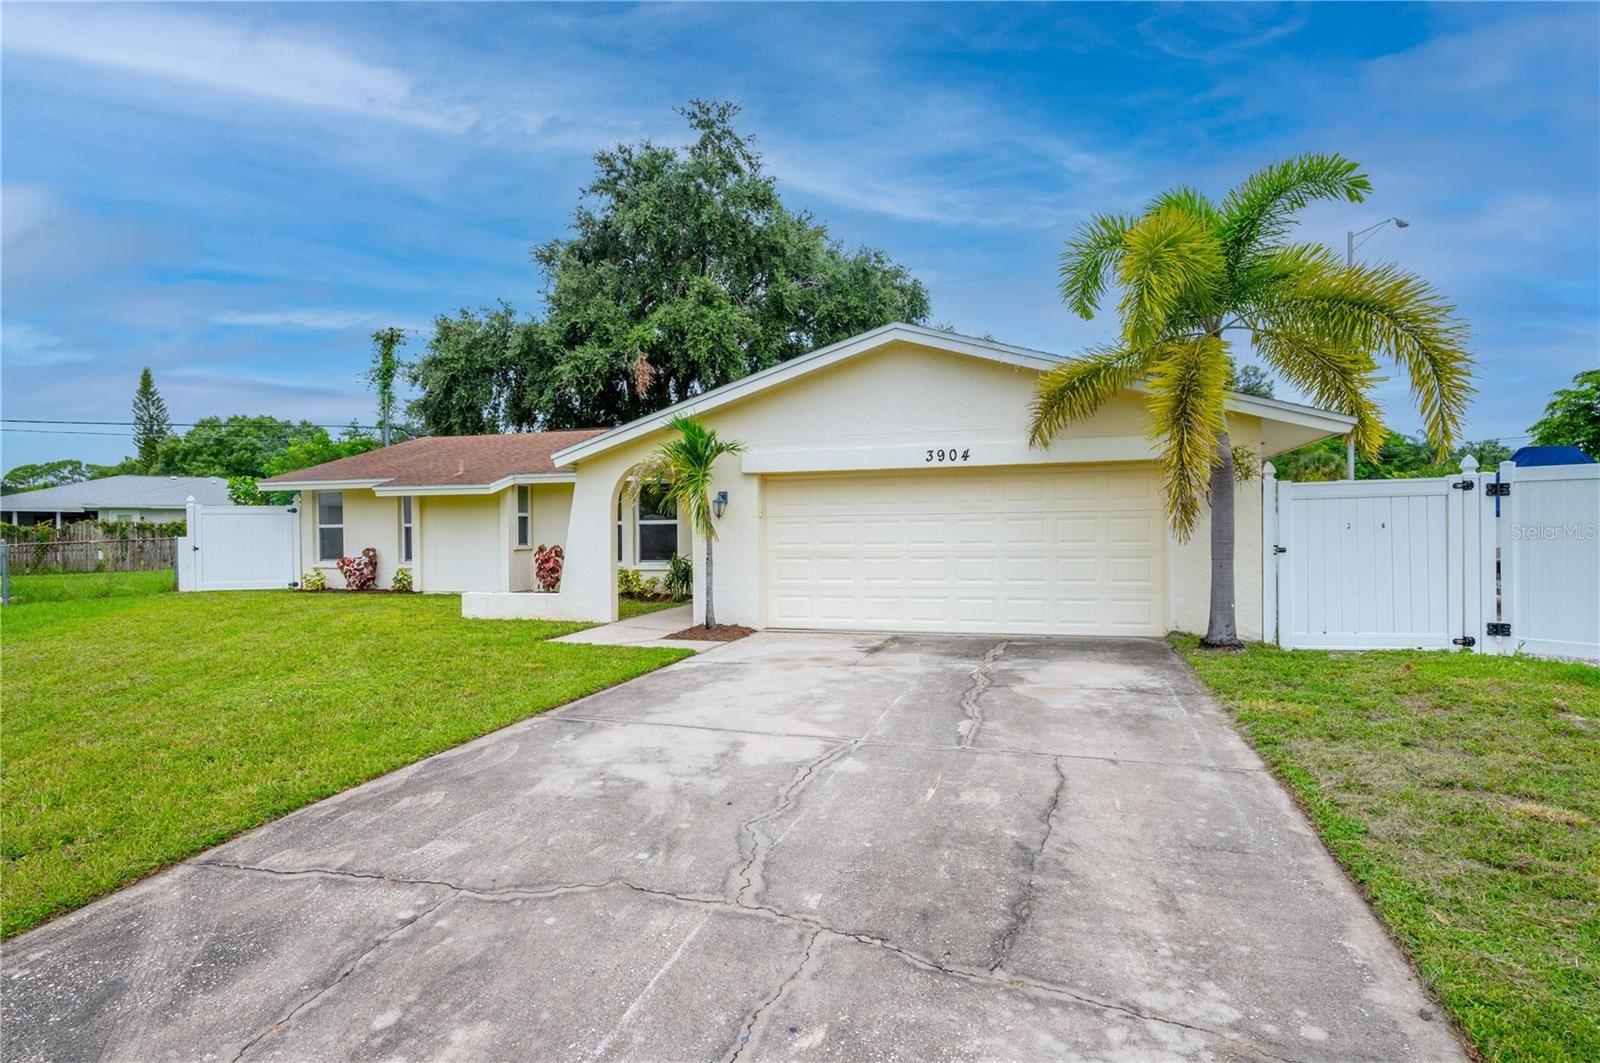 3904 COCHISE TERRACE, Sarasota, FL 34233 - #: A4509043